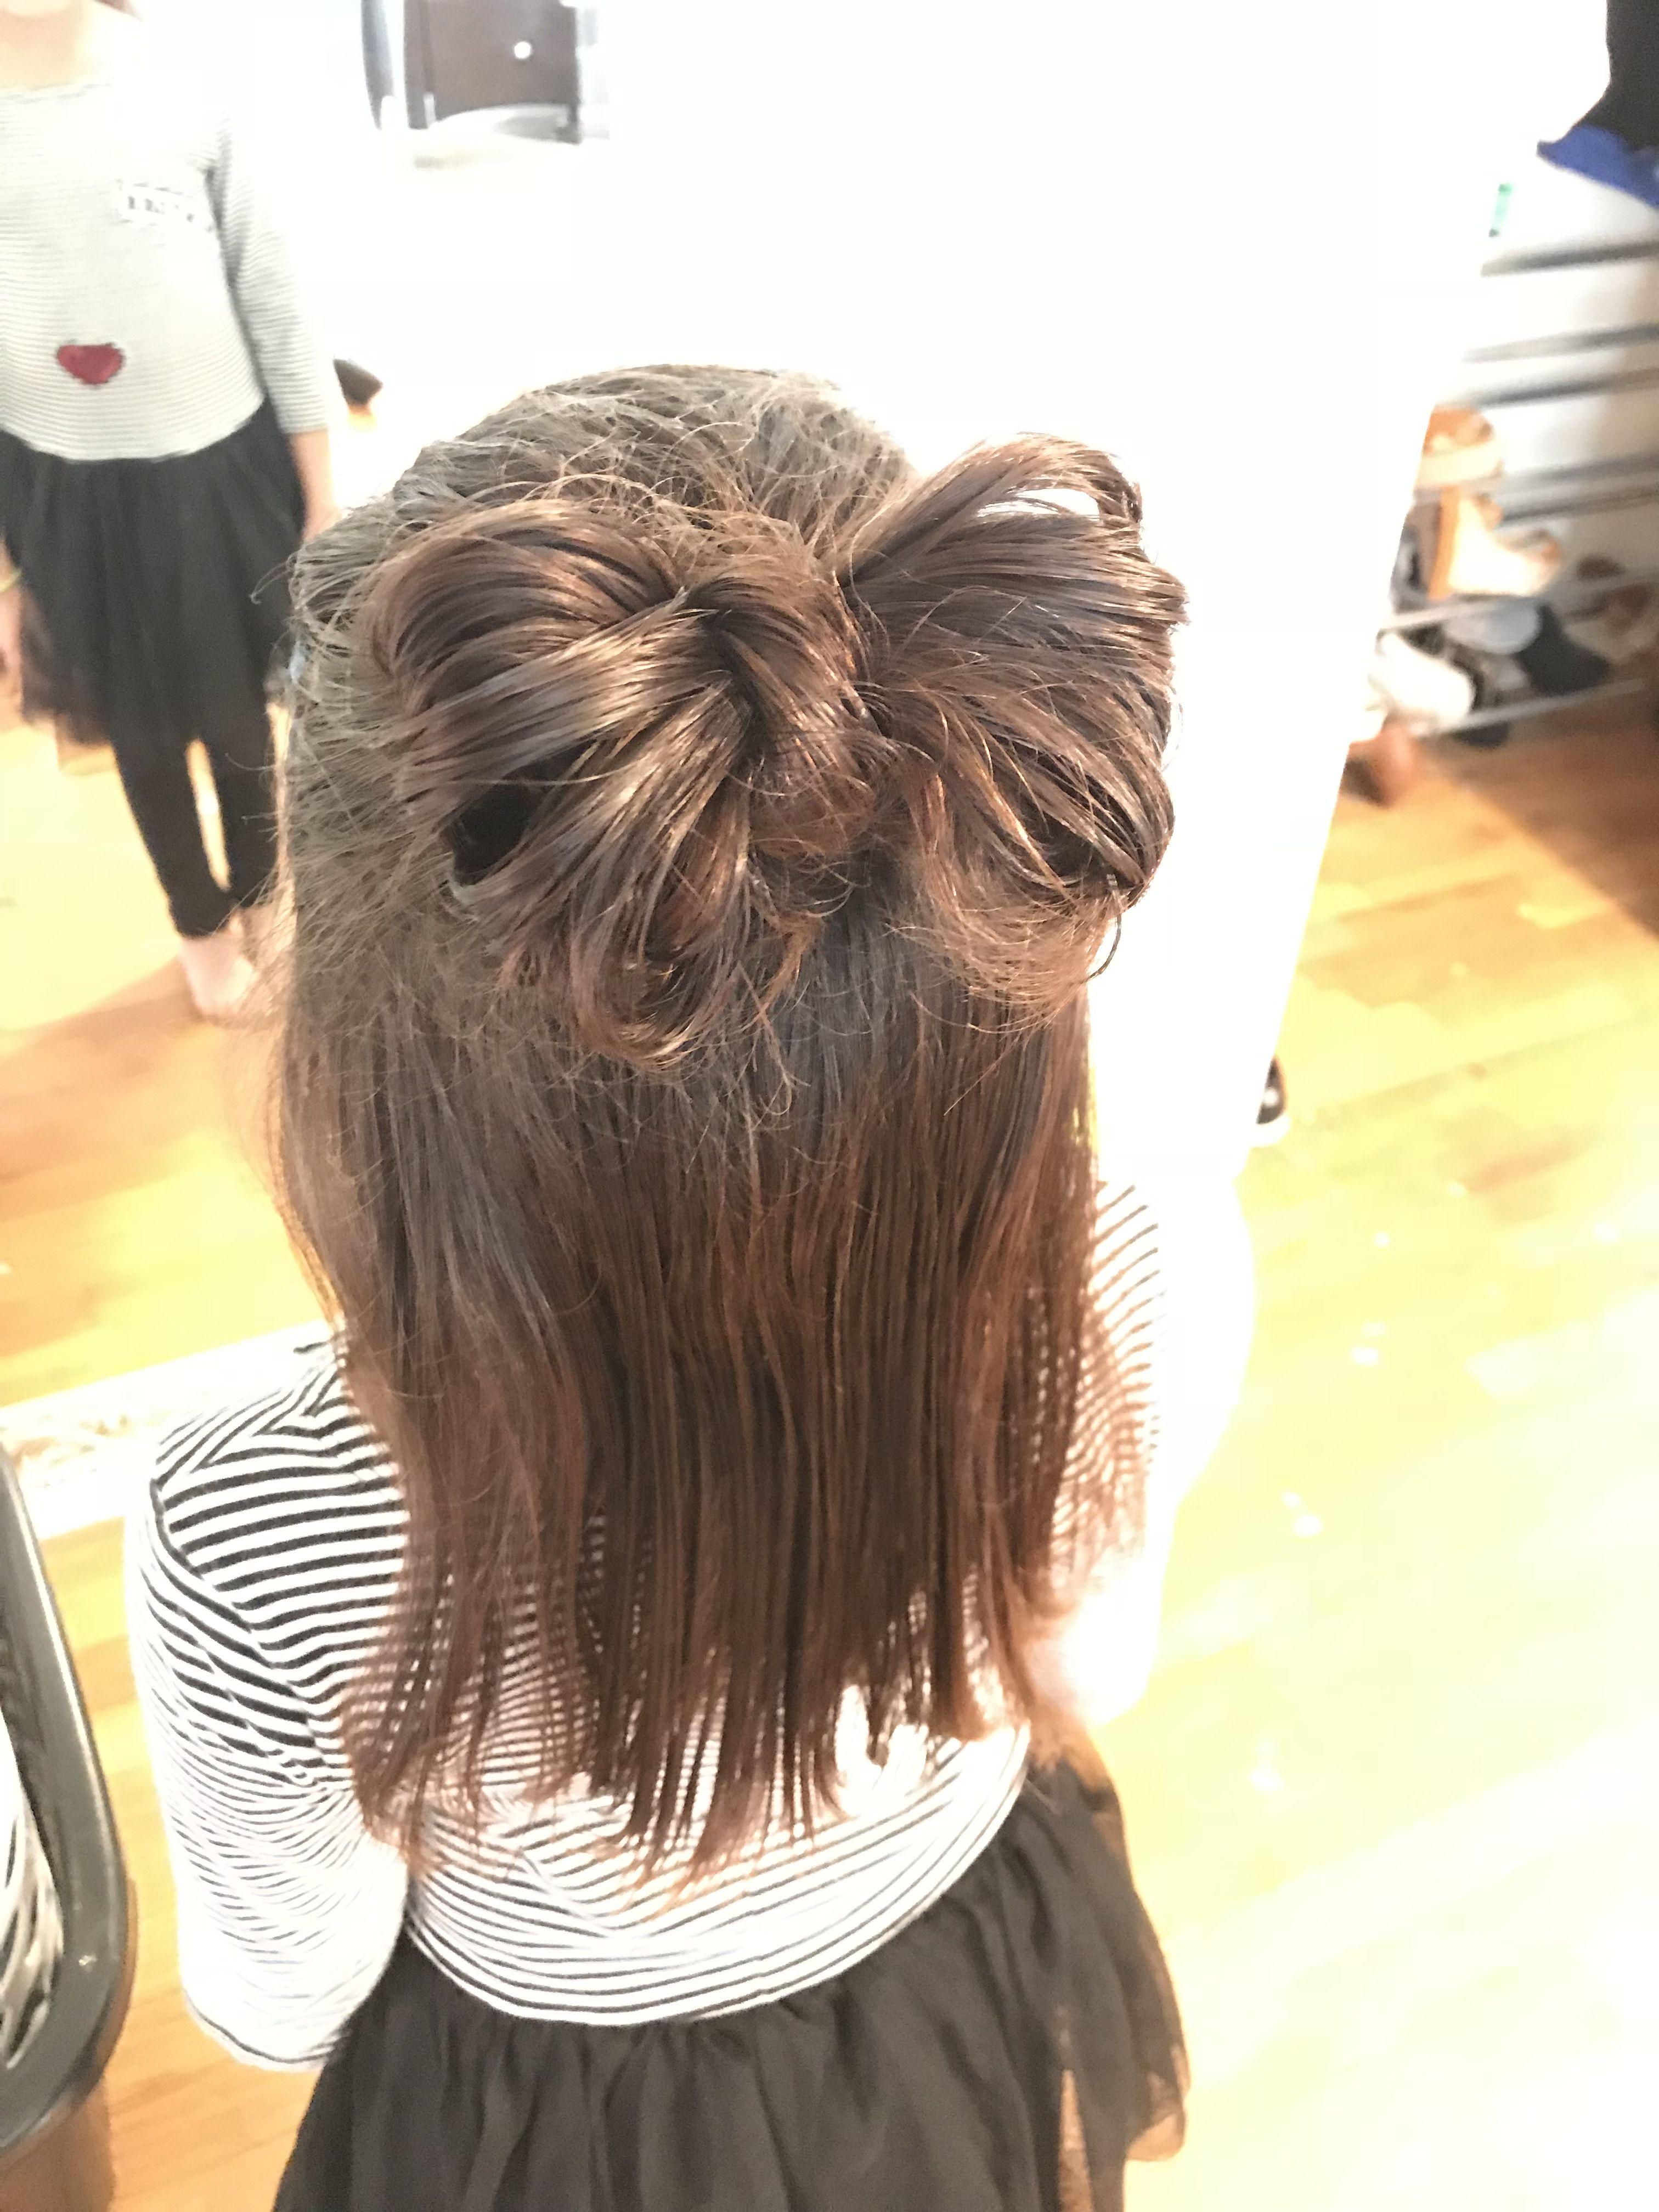 Hair Bow Short Hair Short Hair Styles Hair Beauty